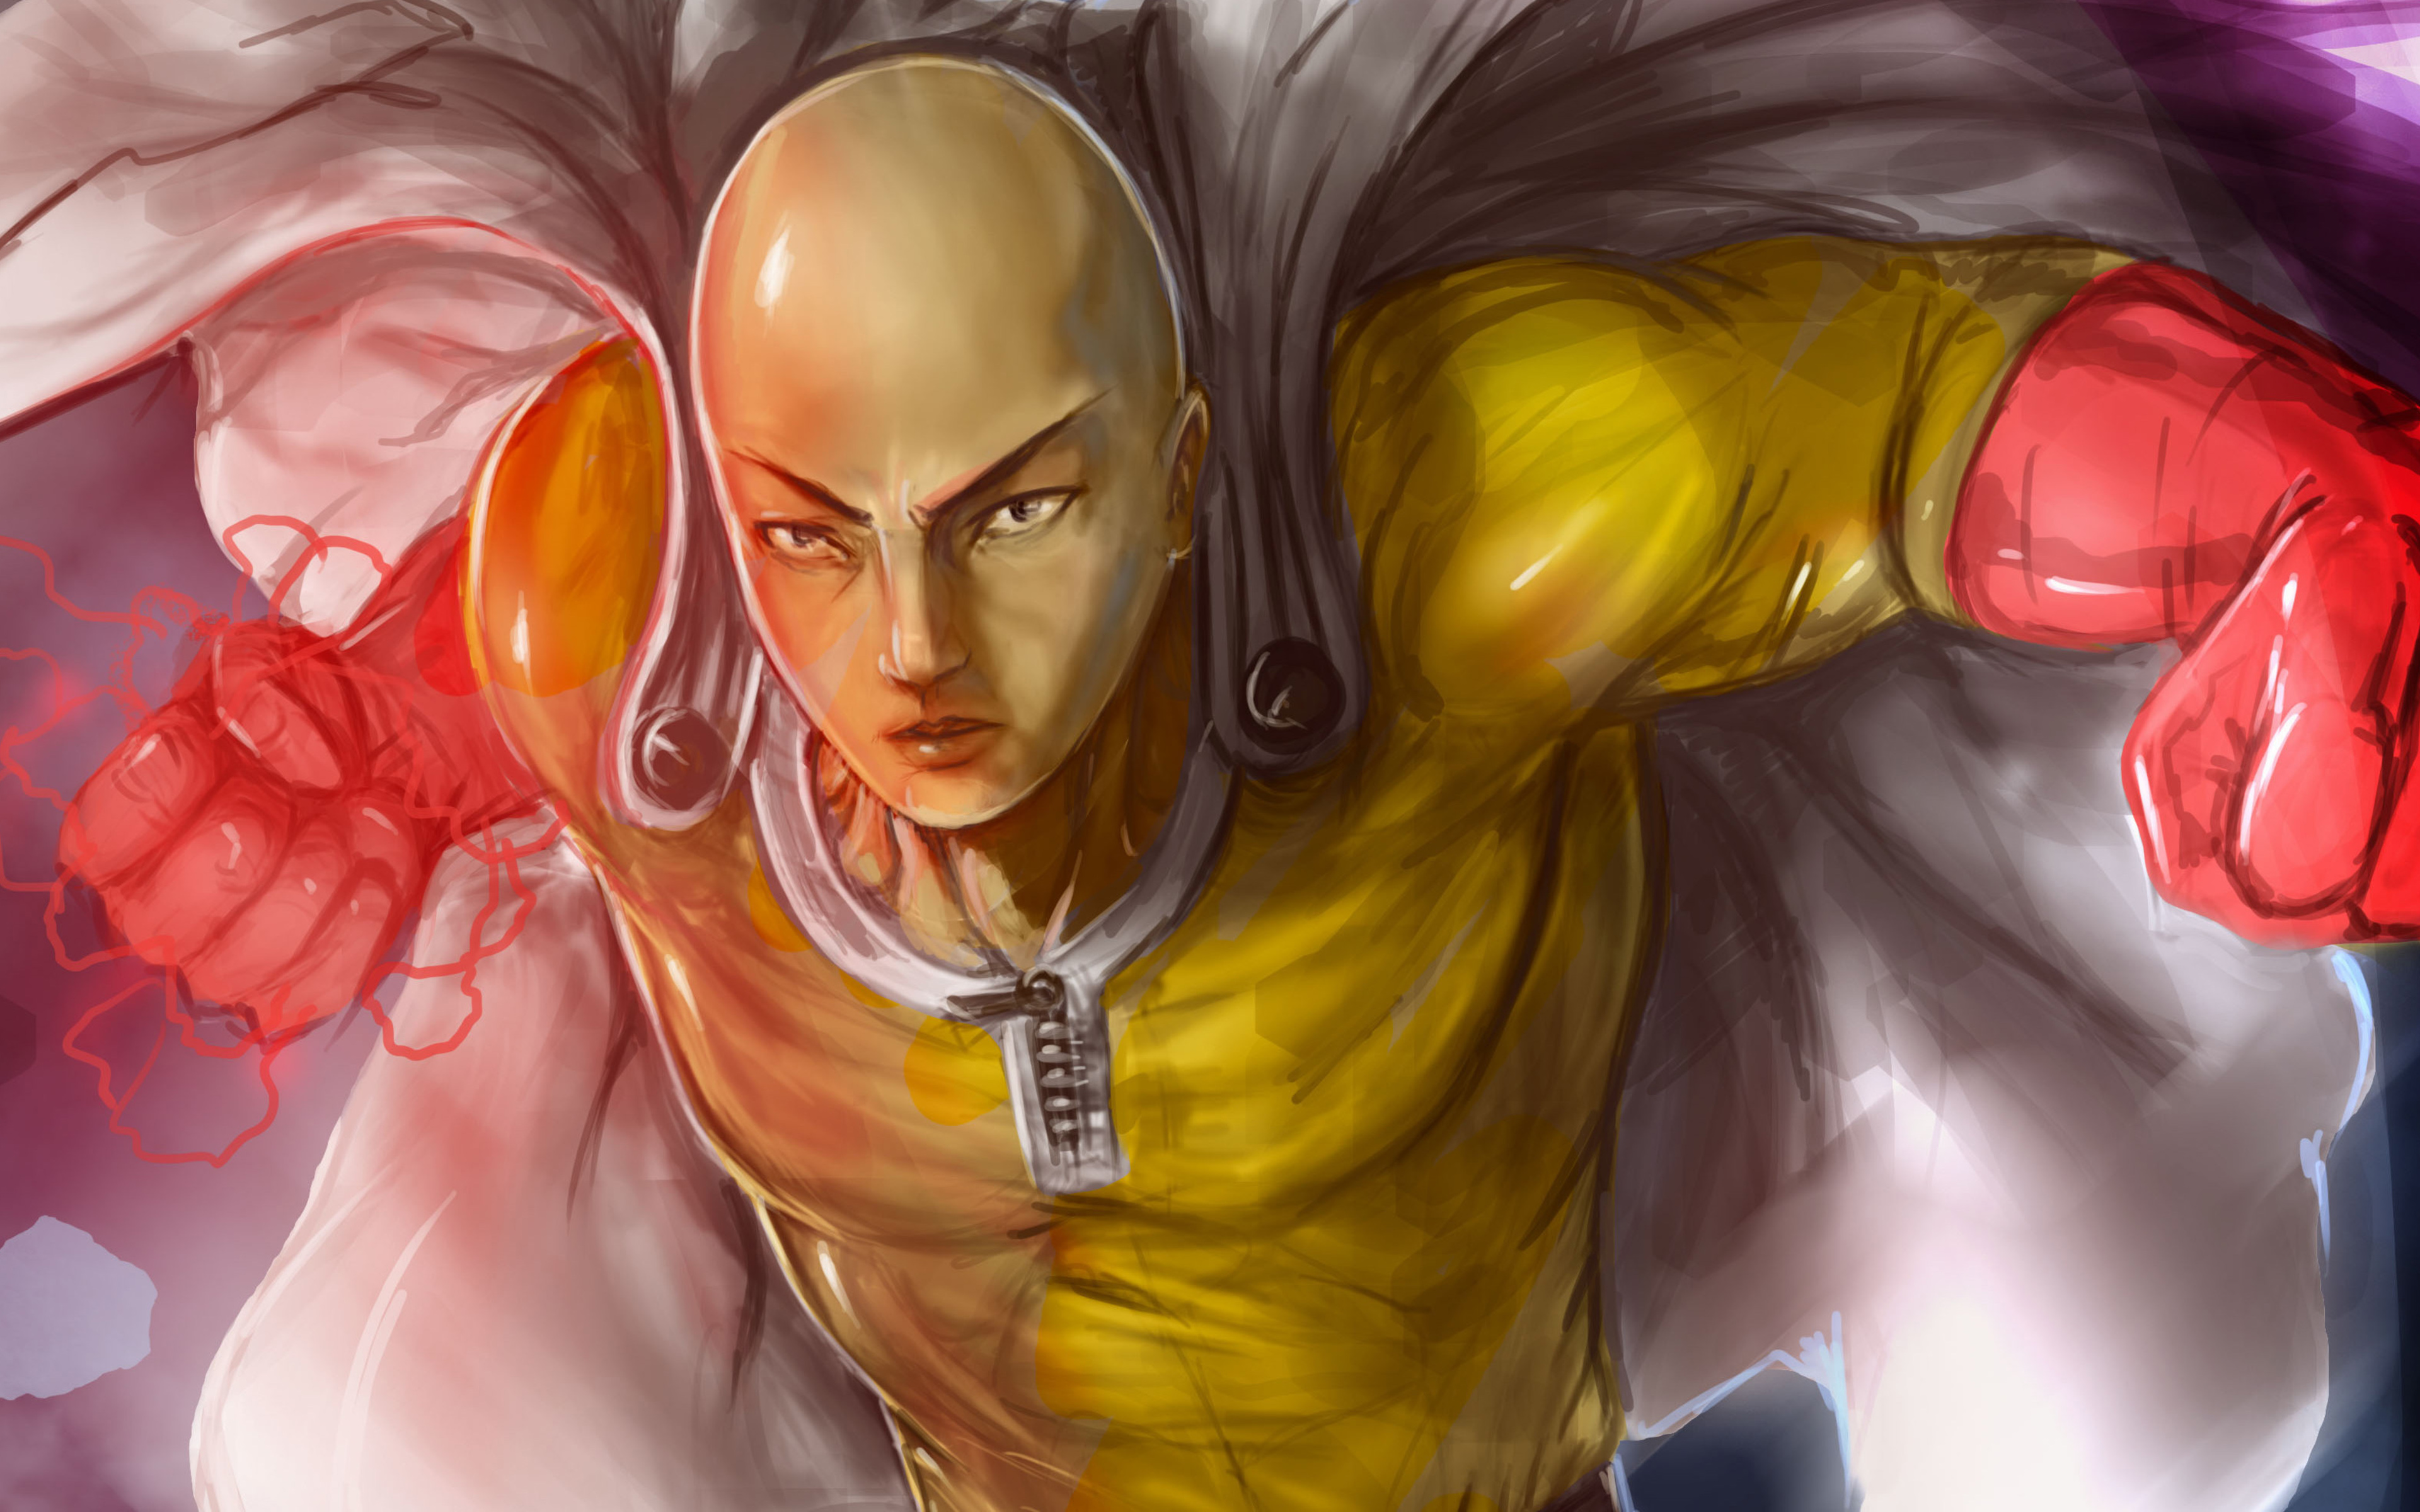 Fondos de pantalla Anime One Punch Man Artwork